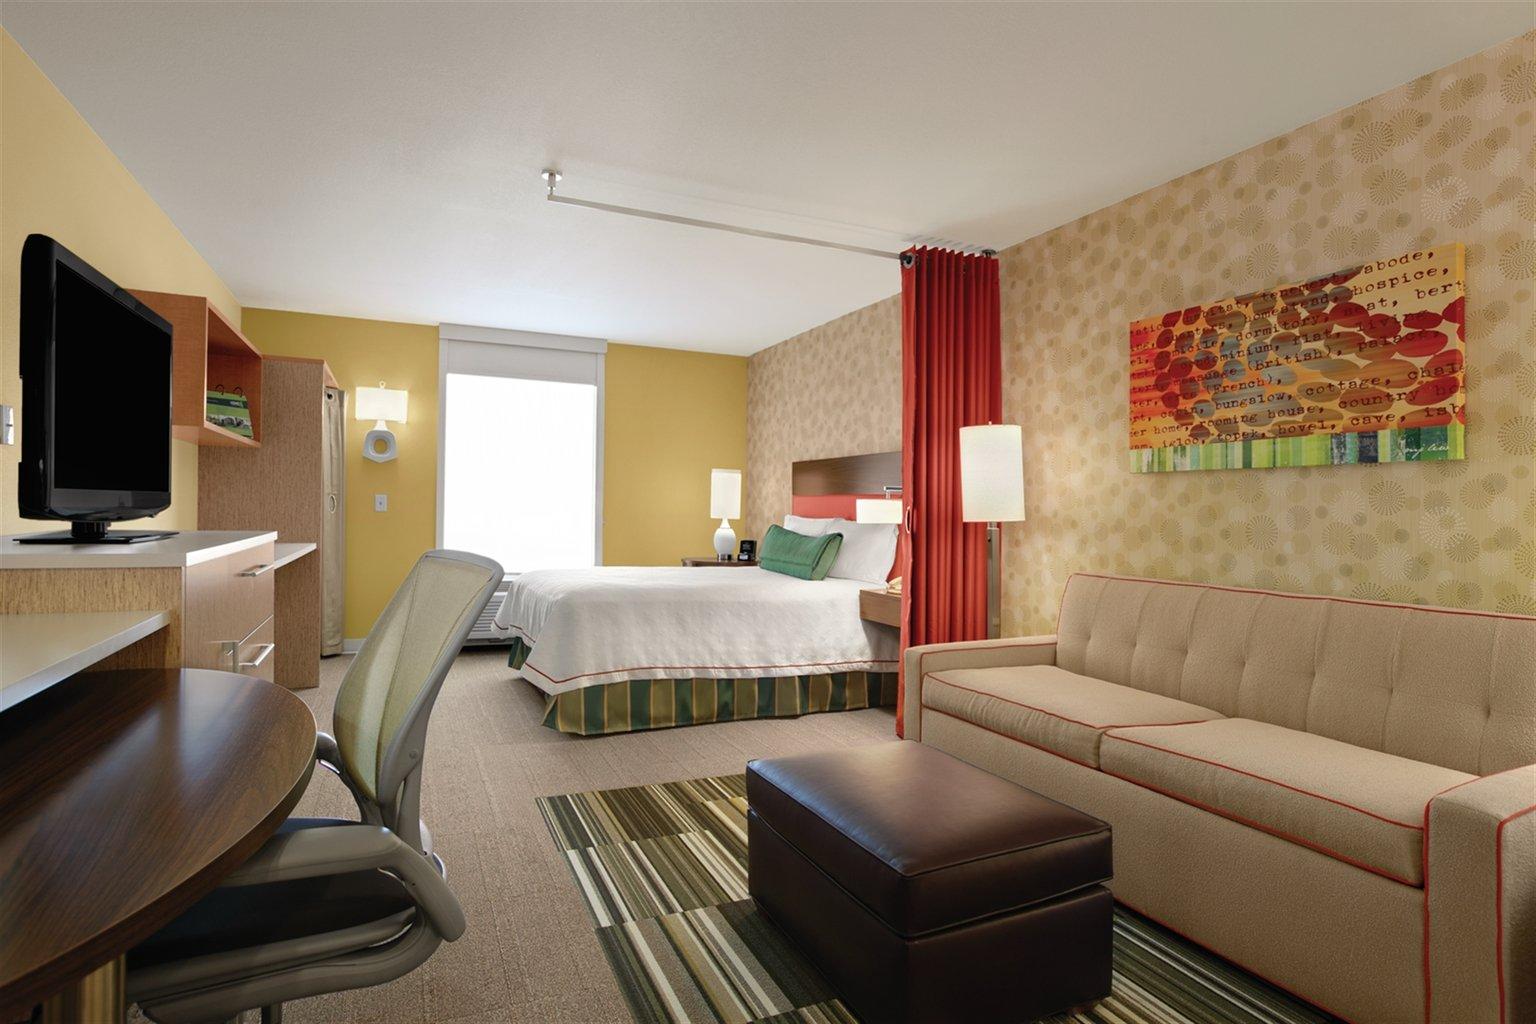 Home2 Suites By Hilton Minneapolis Eden Prairie Updated